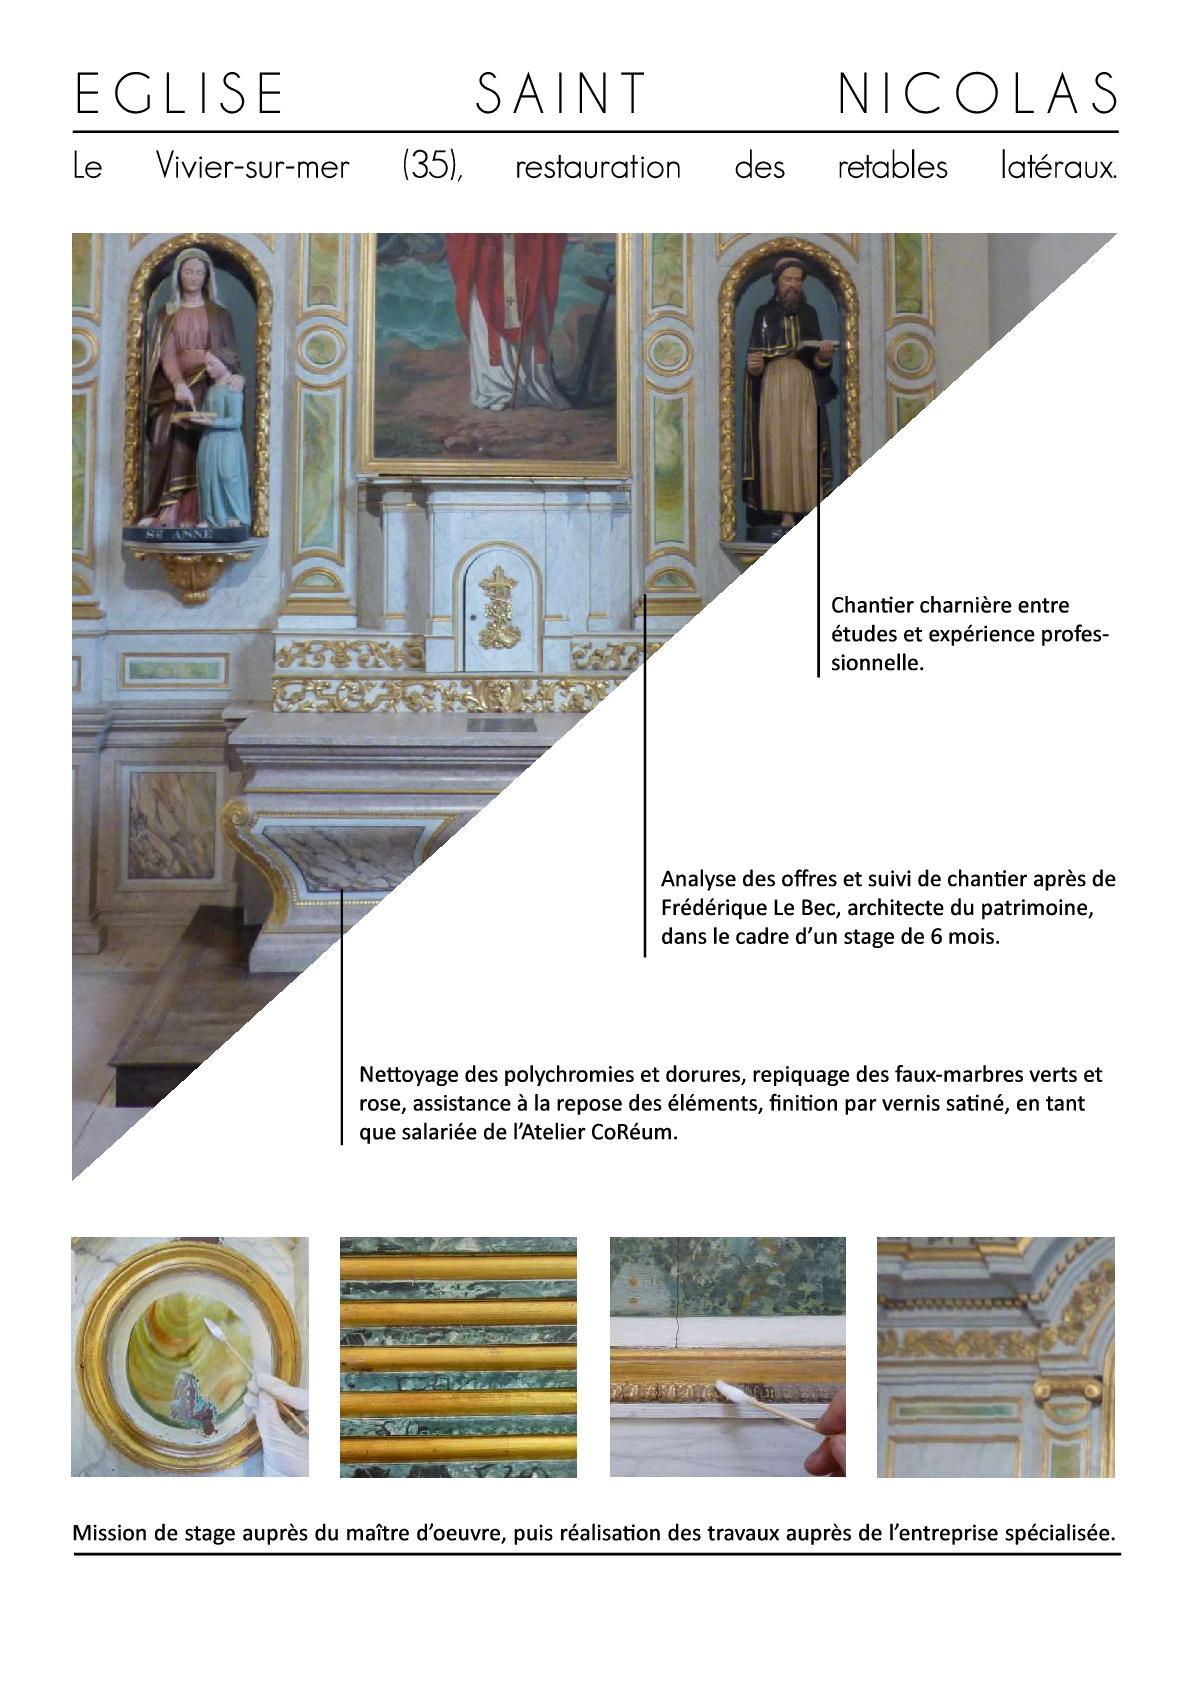 vivier sur mer restauration mobilier retable polychromie bretagne monument conservation objet art